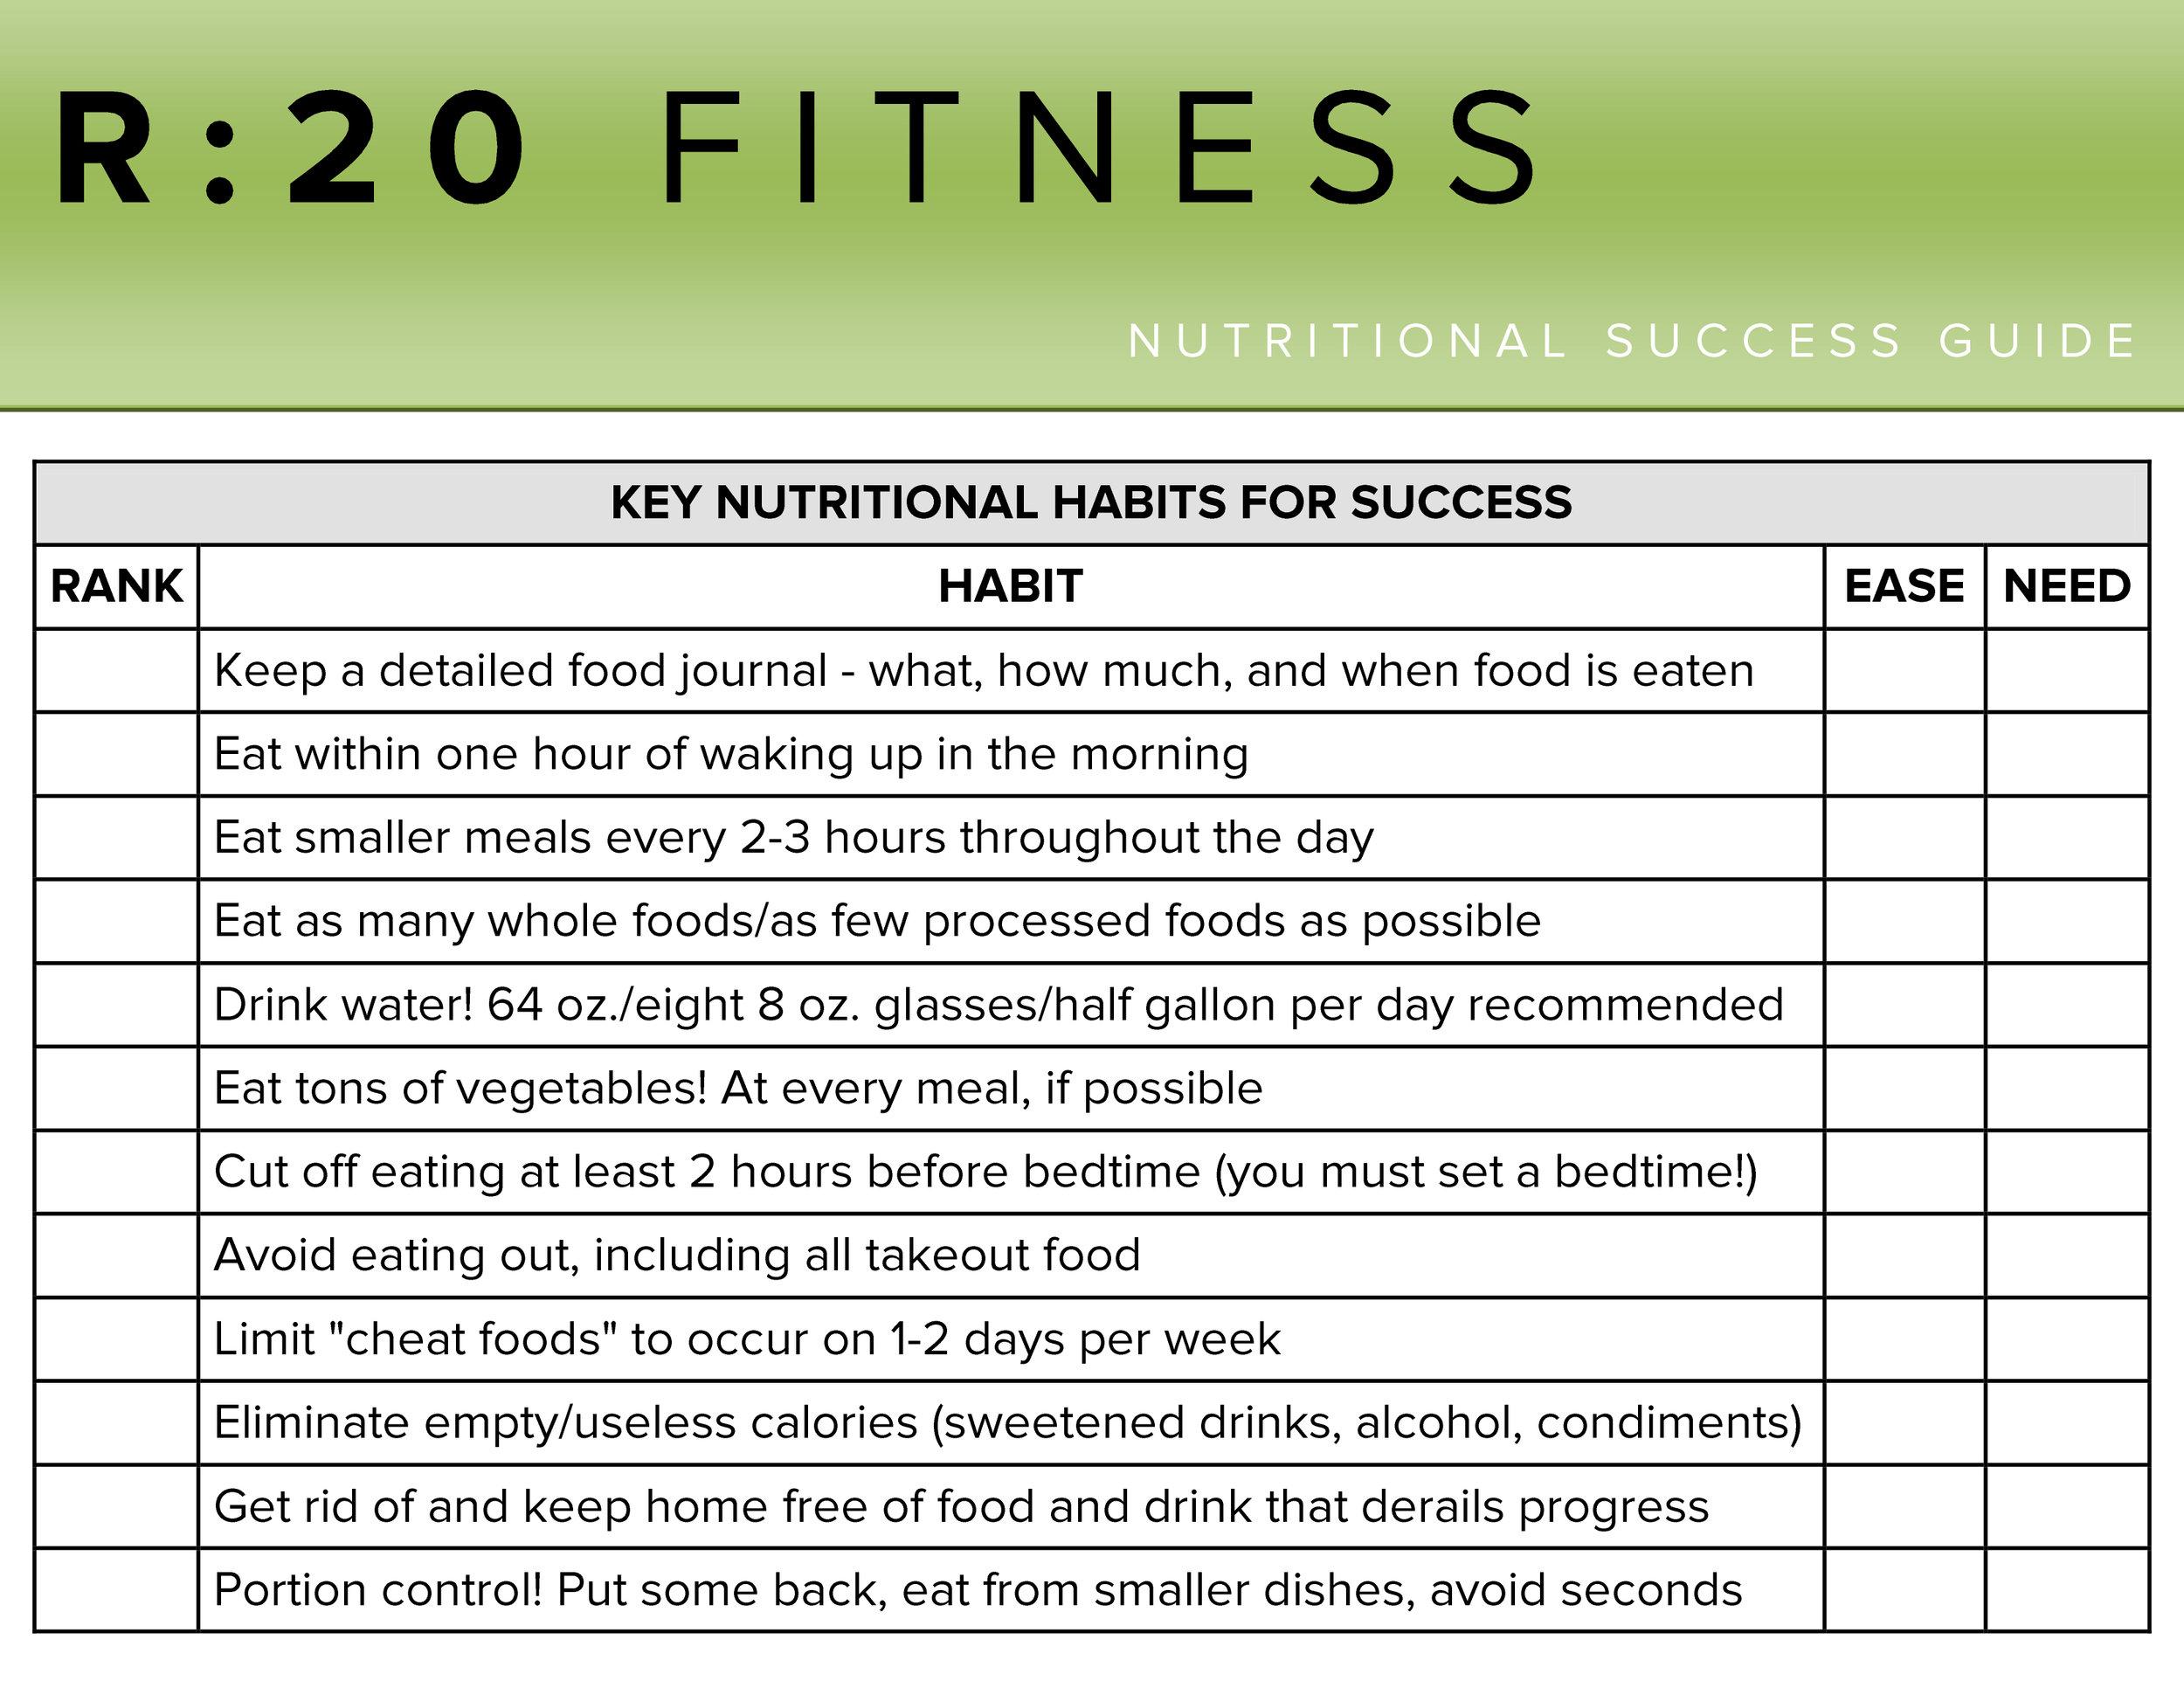 R20 1.0 Nutritional Success Guide-7.jpg